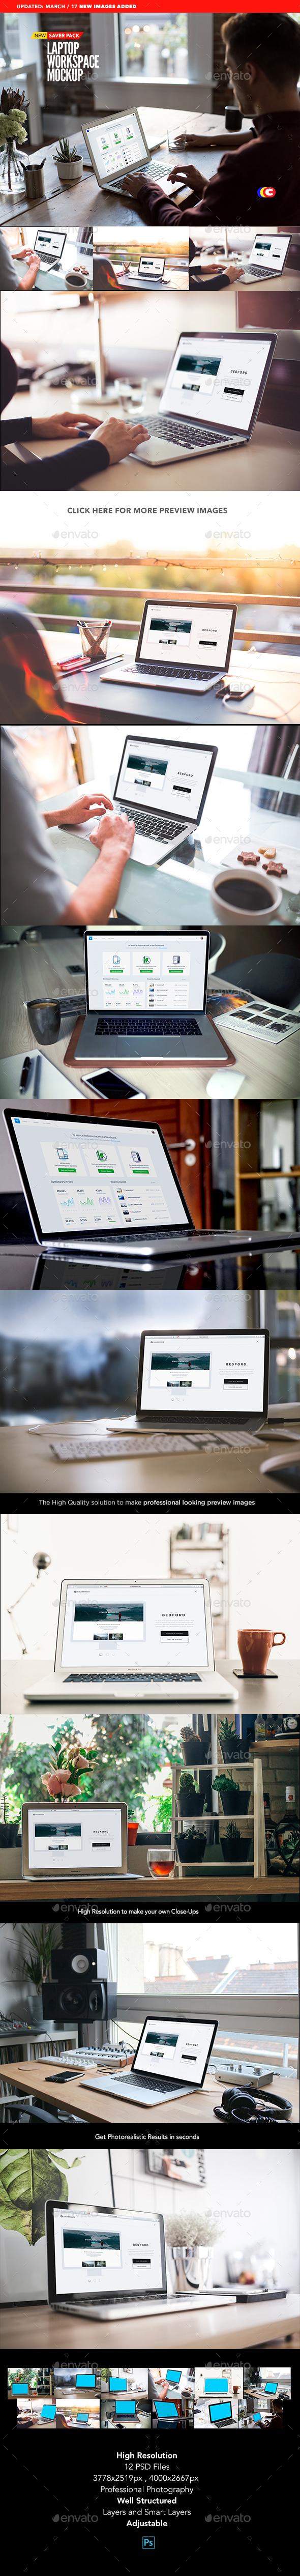 Laptop Display Mock-Up | Workspace Edition - Laptop Displays